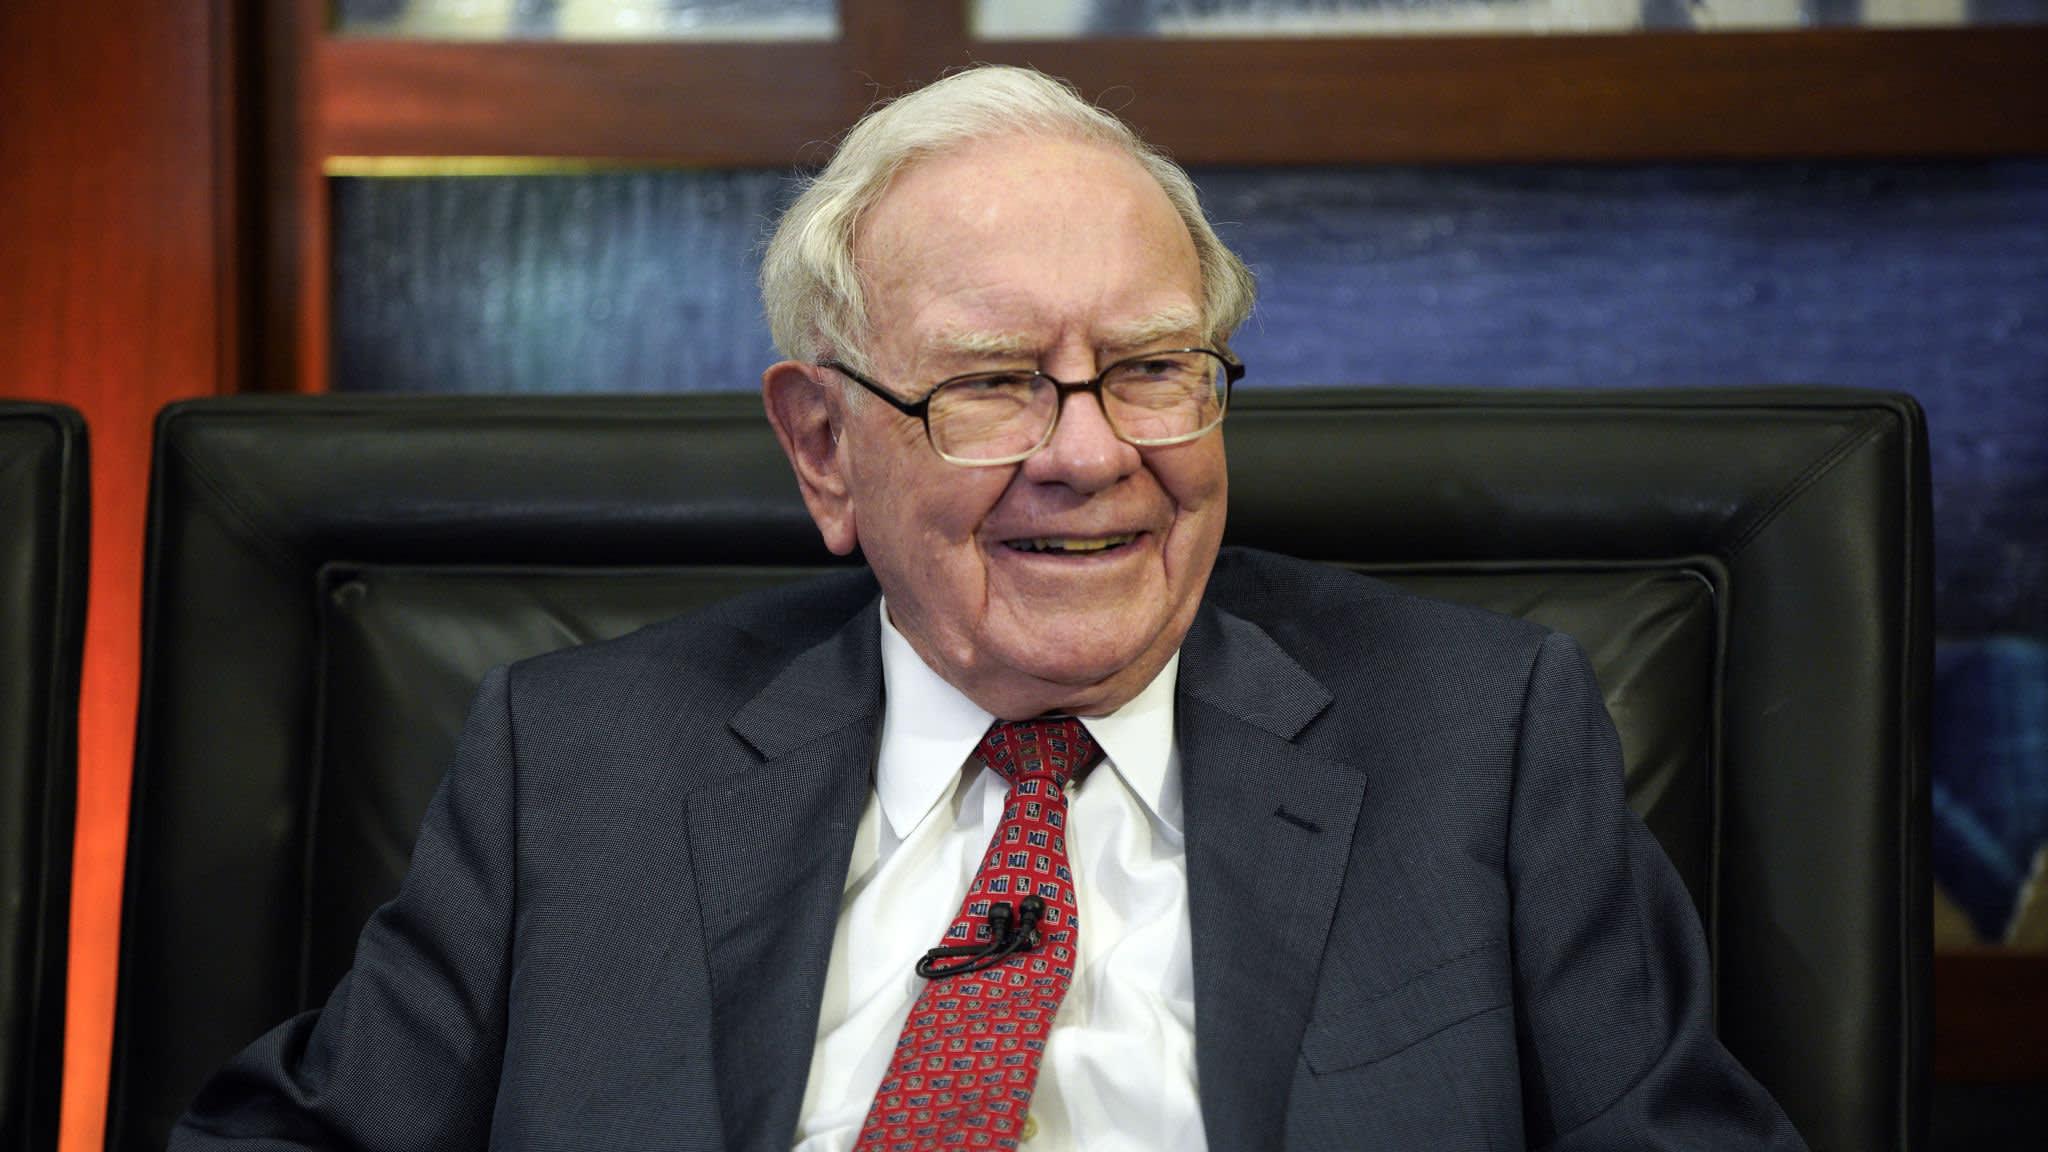 Warren Buffett's Berkshire Hathaway posts sharp rise in profits